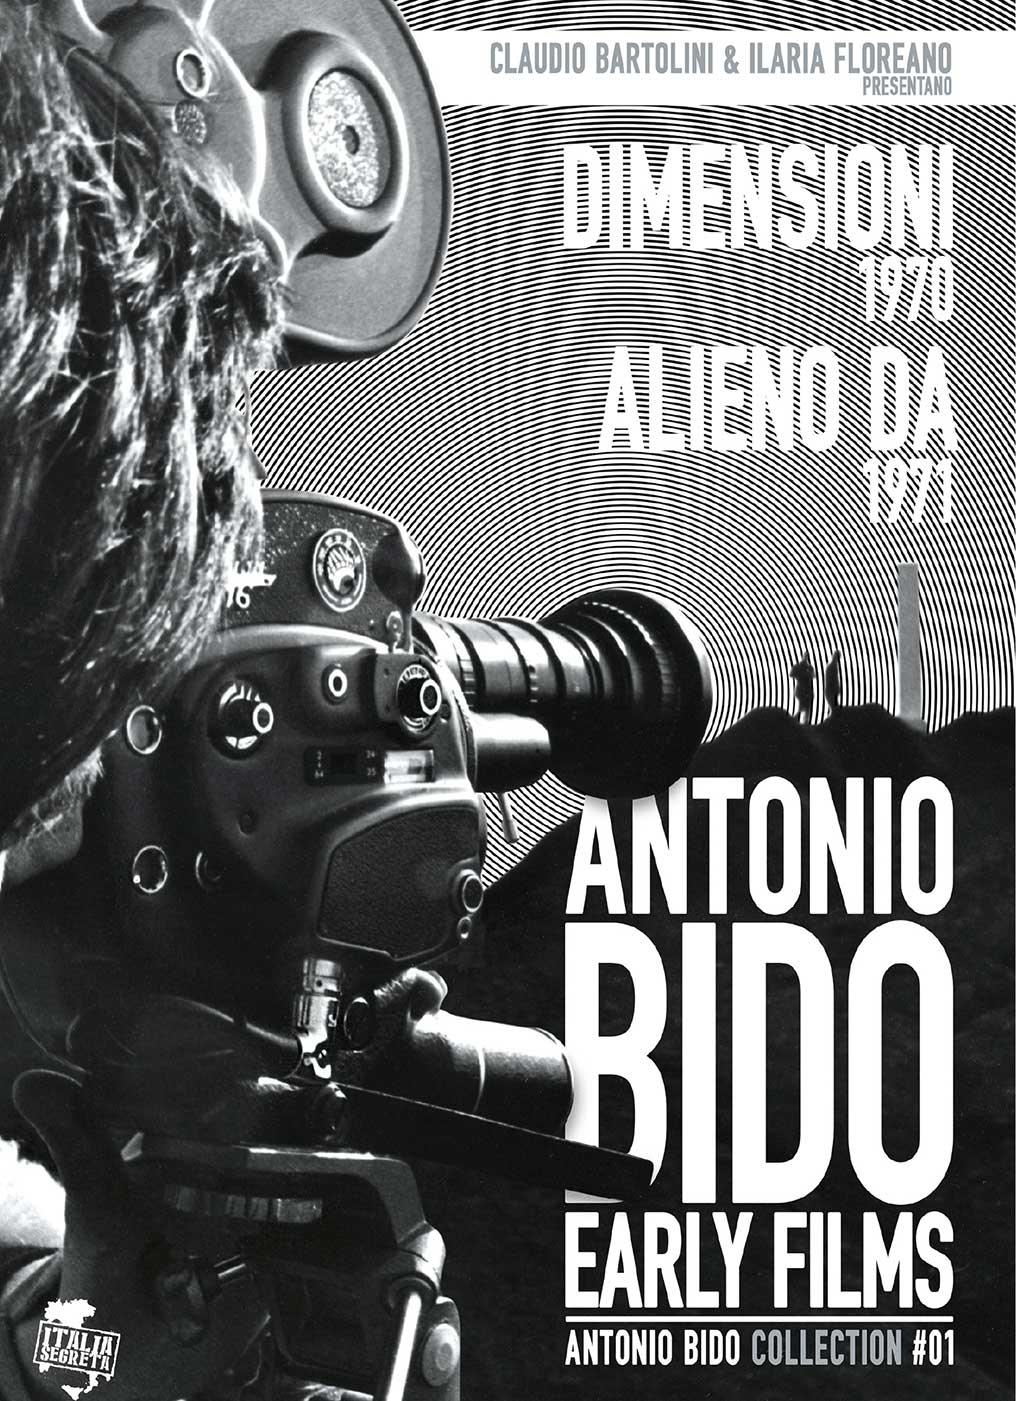 ANTONIO BIDO - EARLY FILMS (DVD)